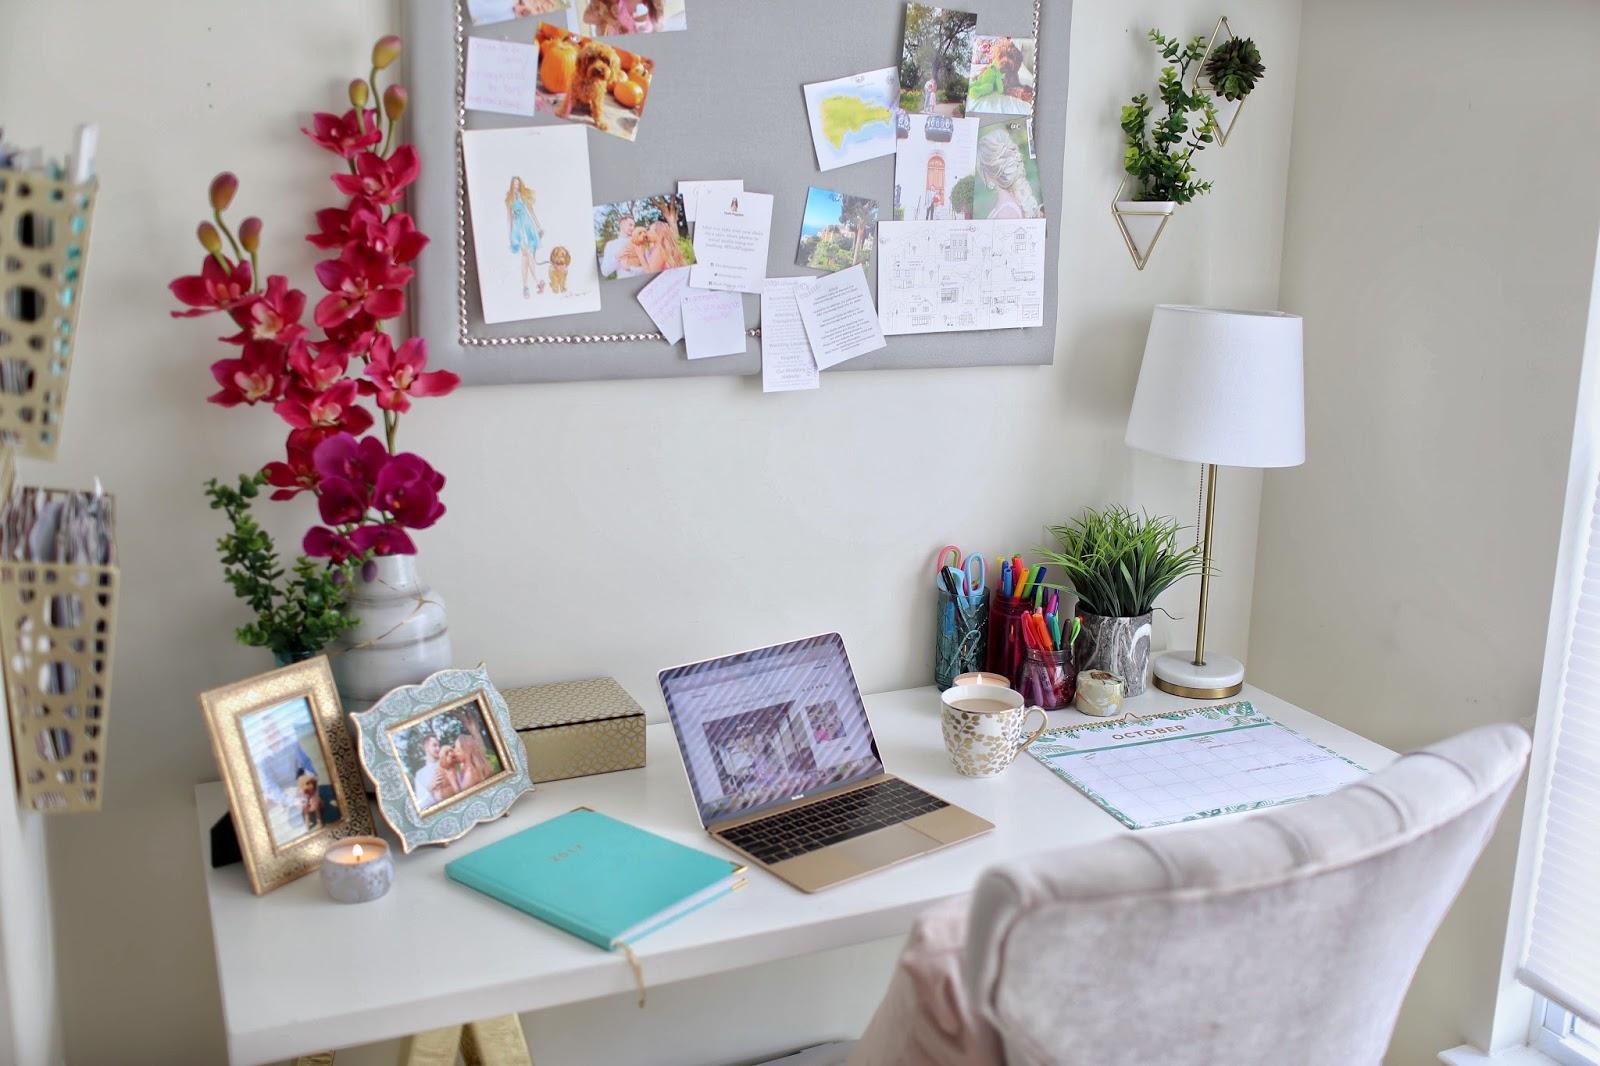 100+ [ Design Essentials Home Office ] | Built In Bookshelves ...